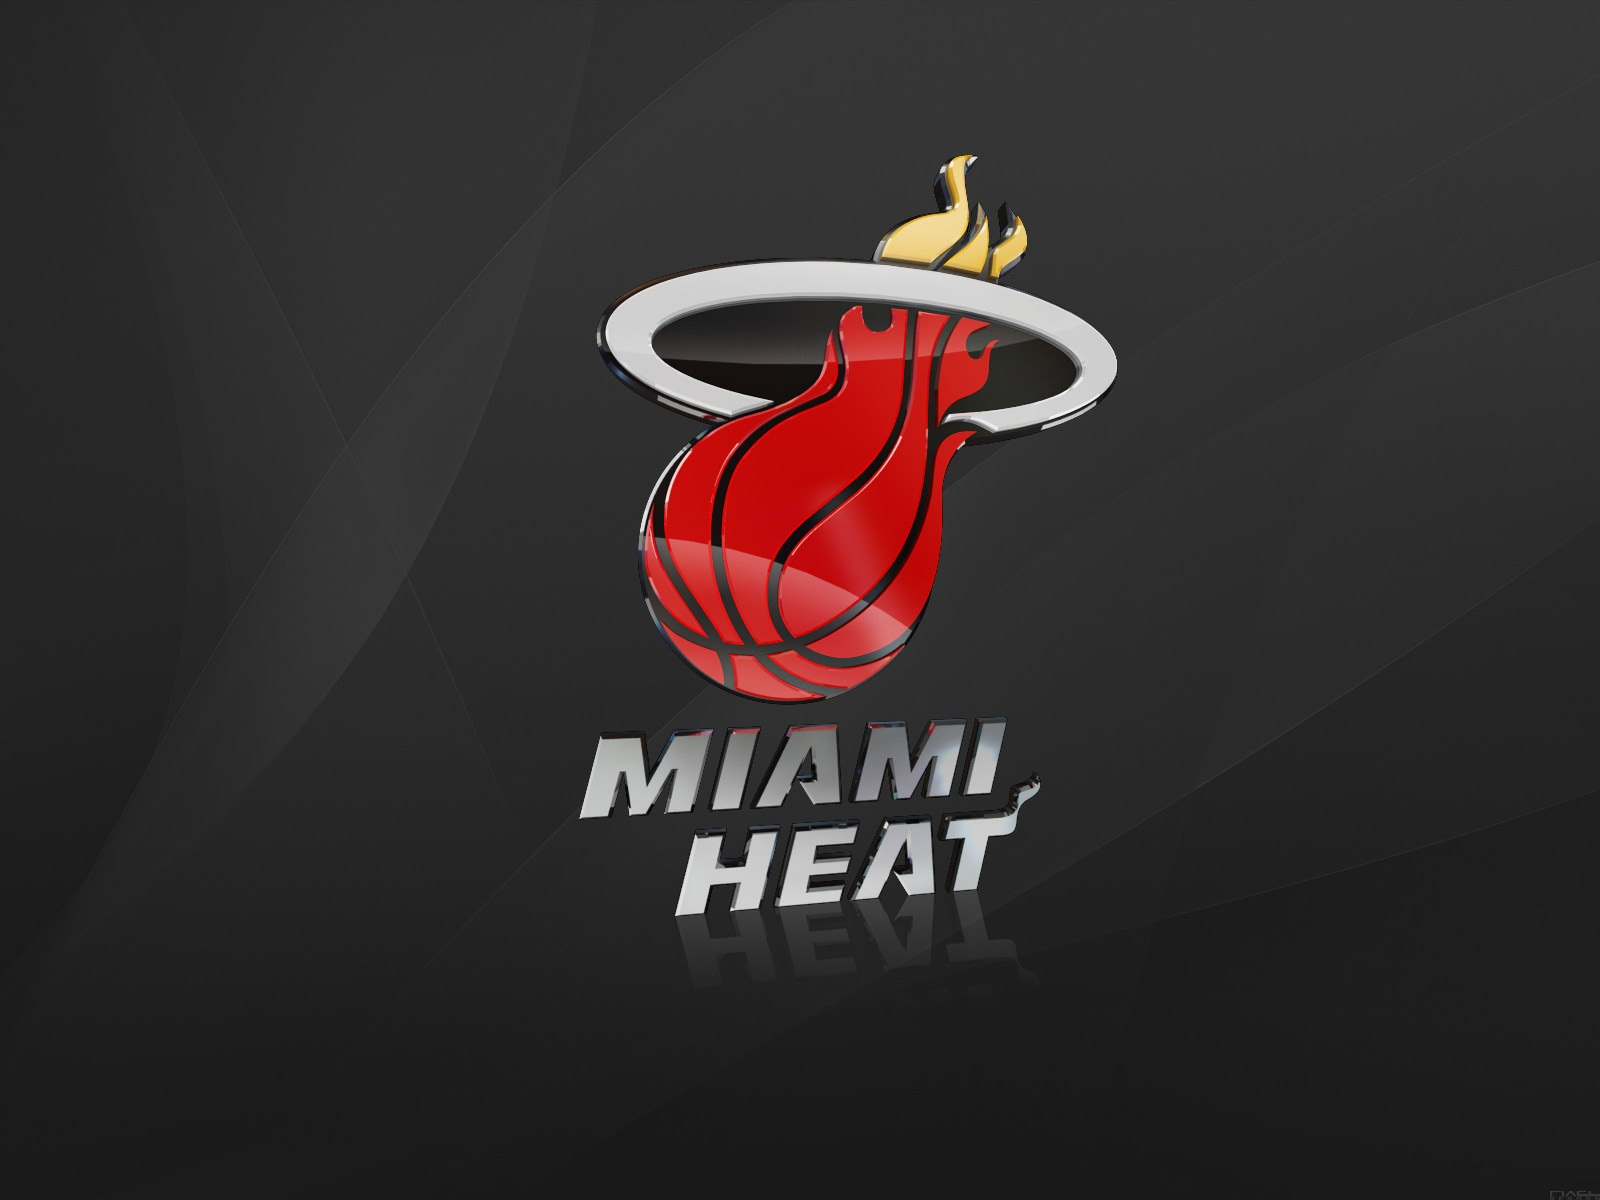 Miami Heat HD Wallpapers 2013 2014 HD Wallpapers 1600x1200